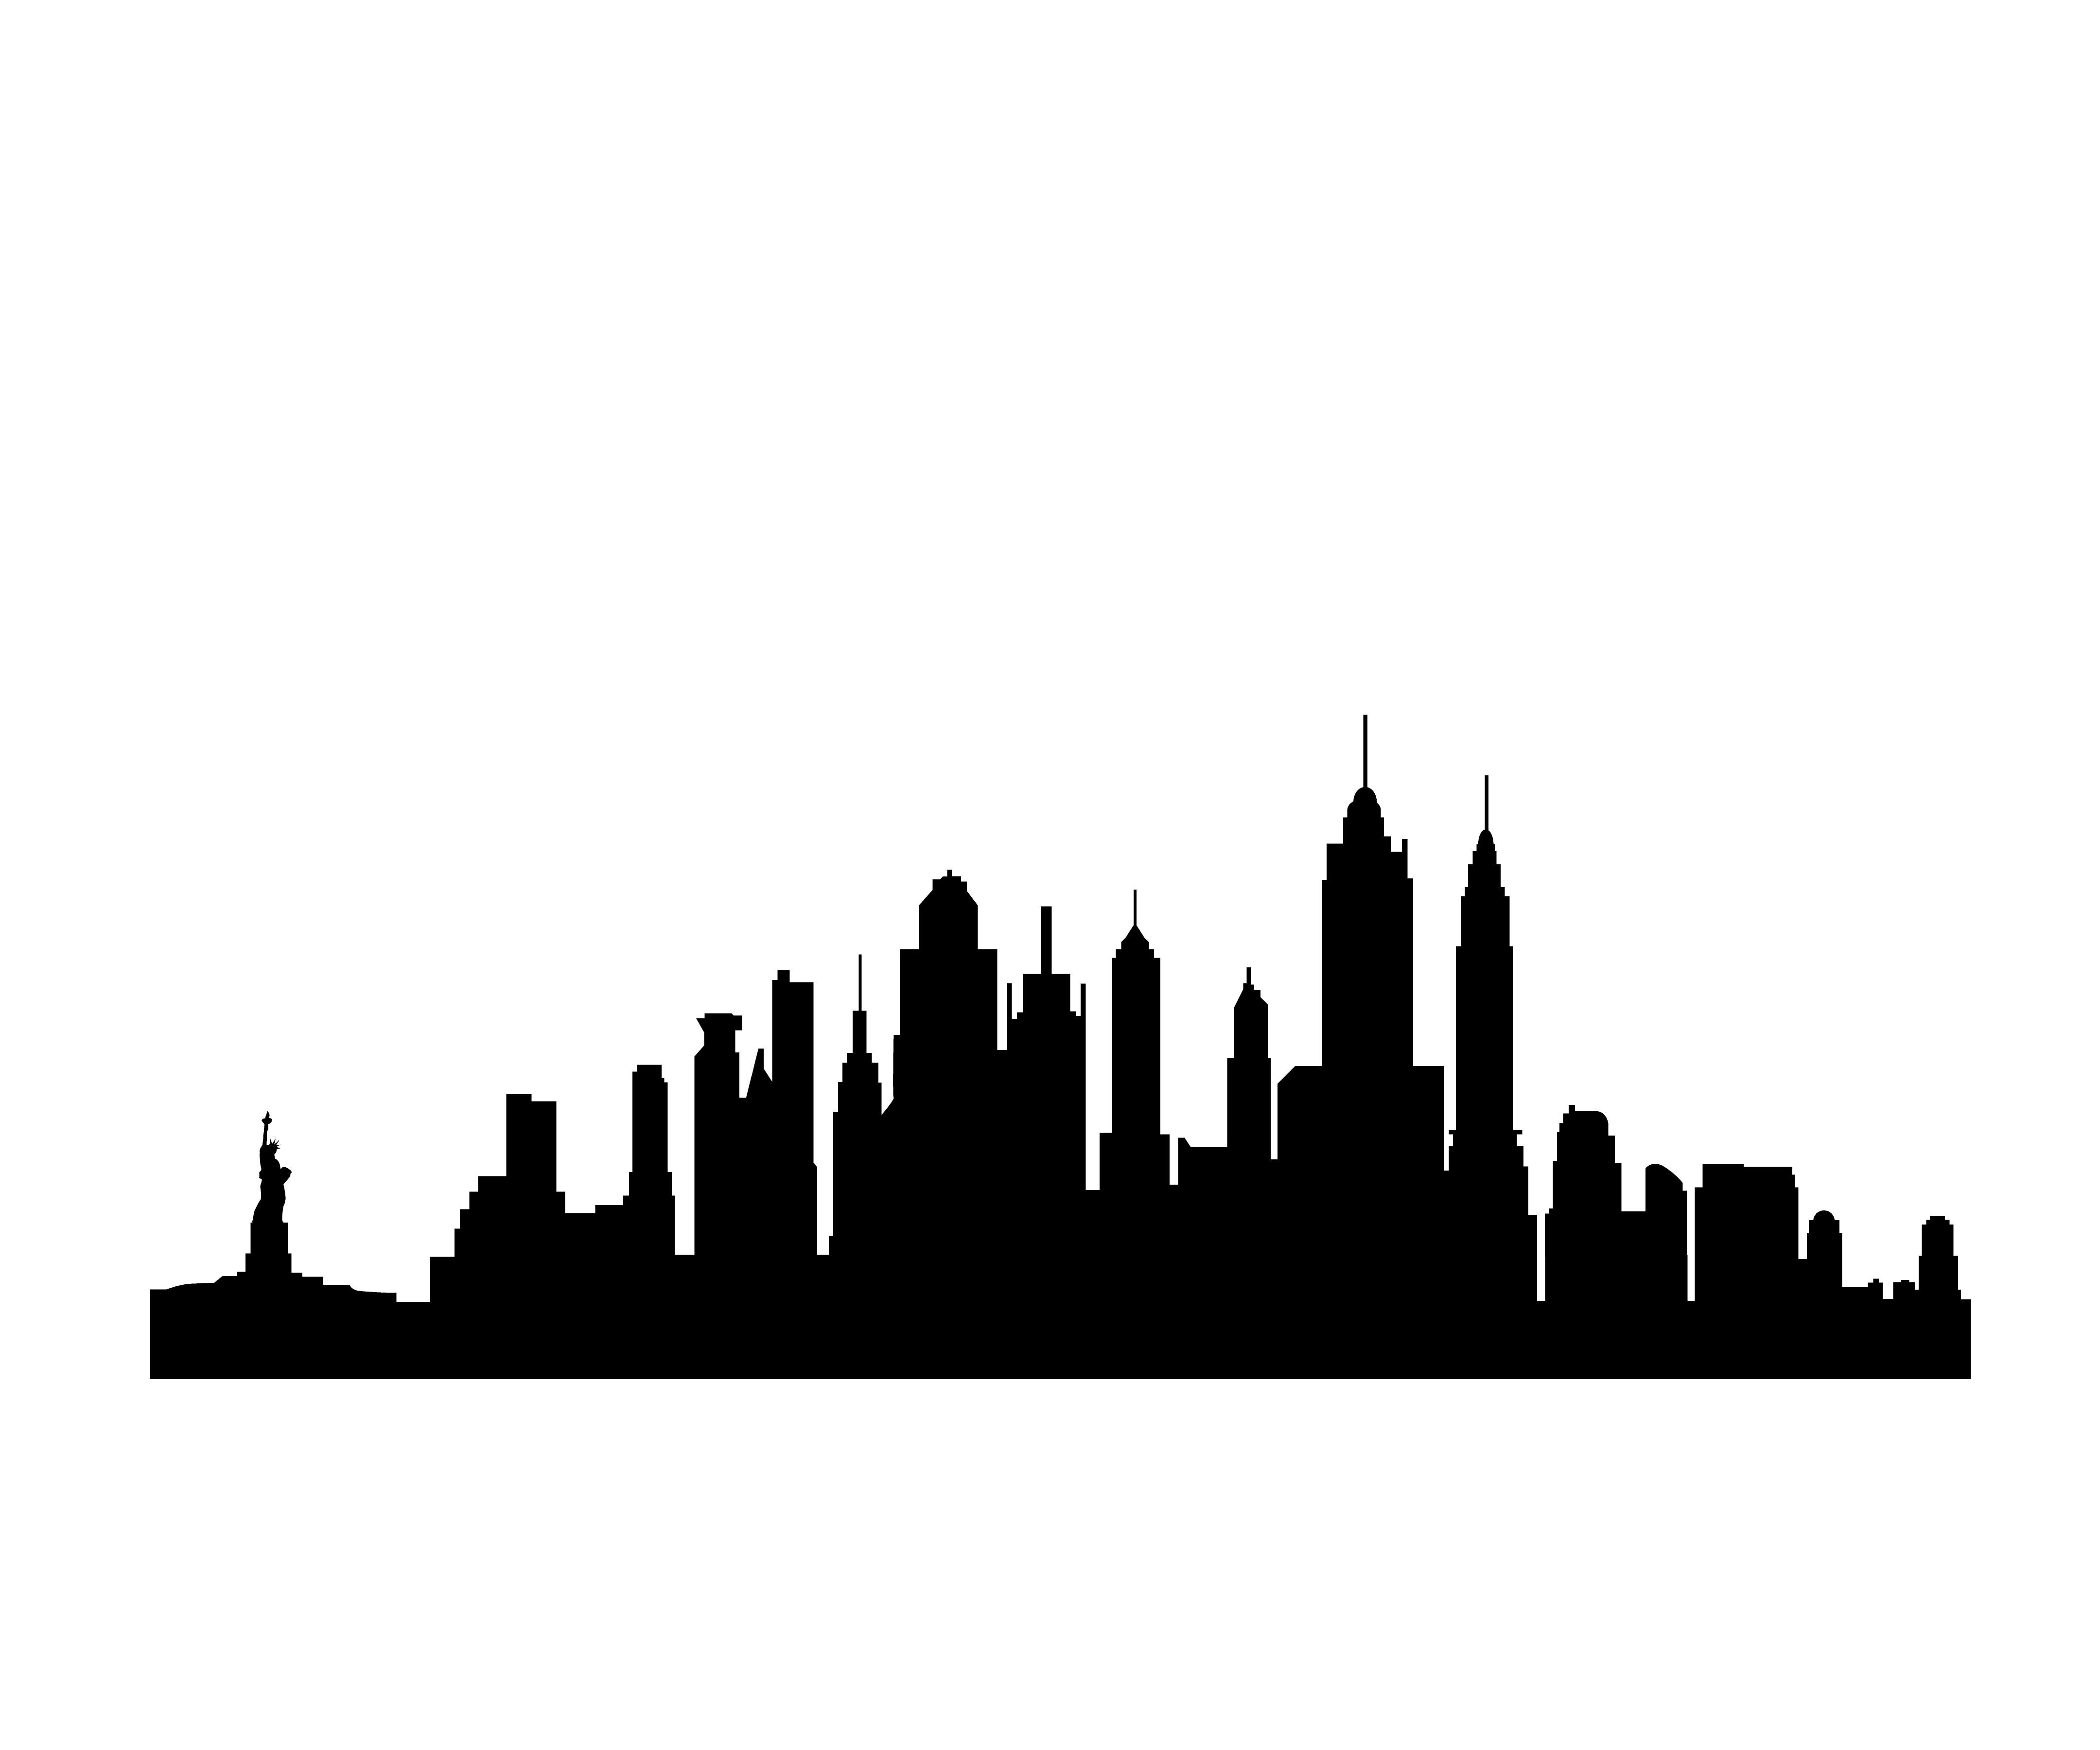 13 Free Clip Art New York City Skyline S-13 Free Clip Art New York City Skyline Silhouette Free Cliparts That-0